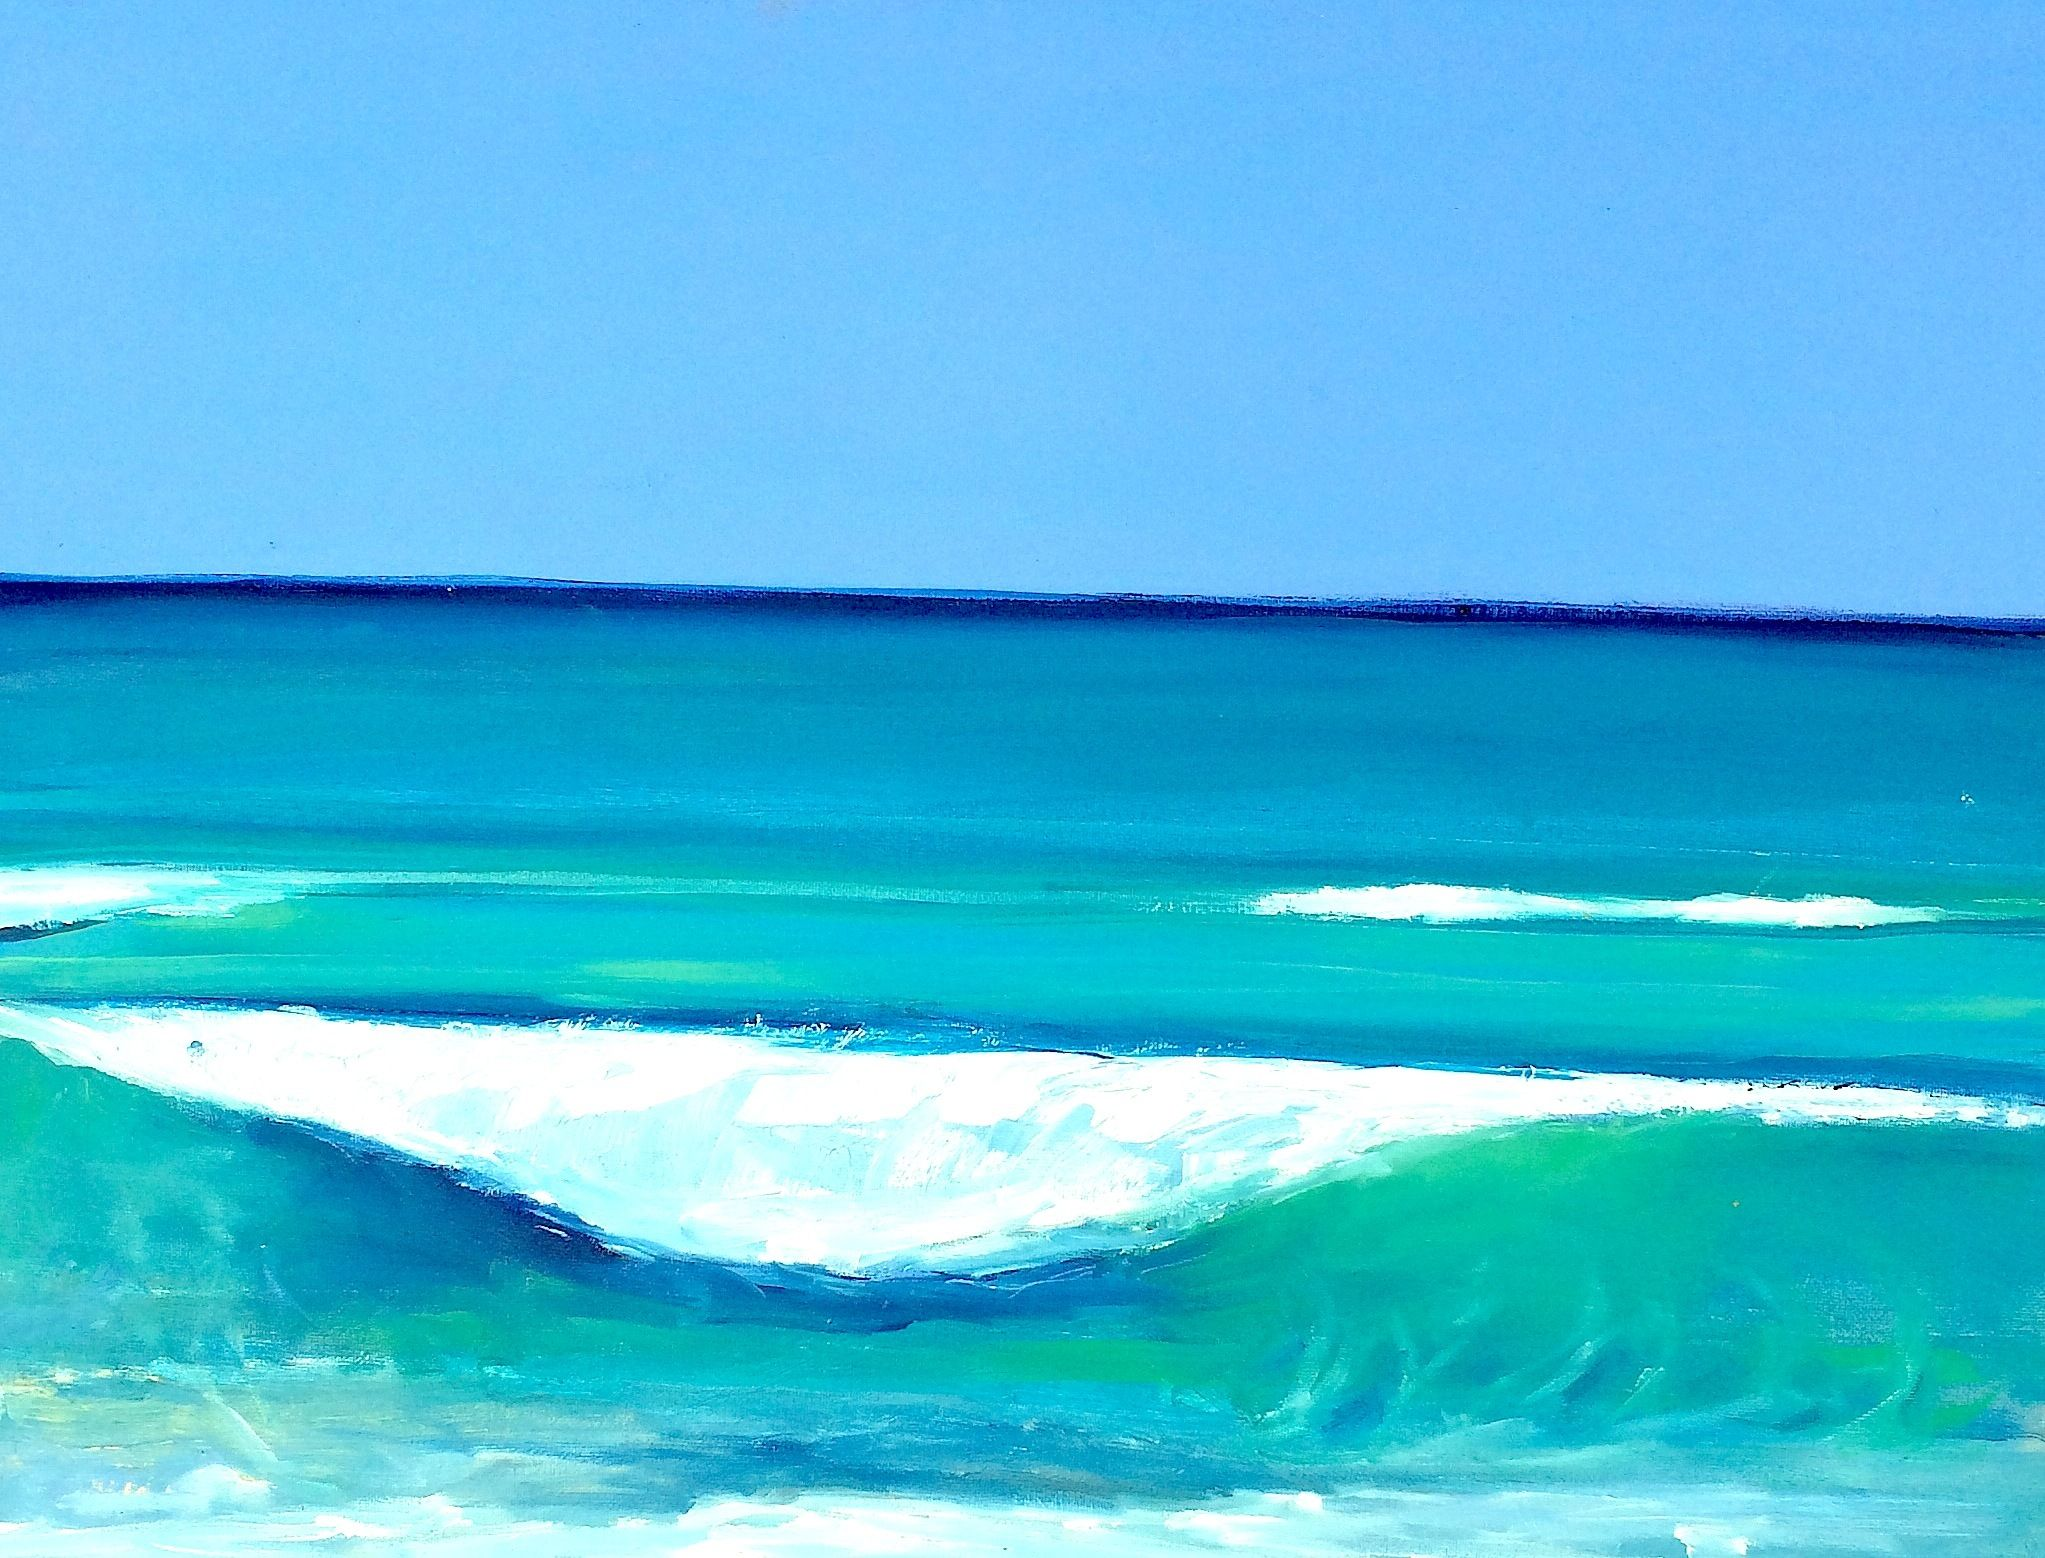 New wave by arun prem monochromatic art art waves